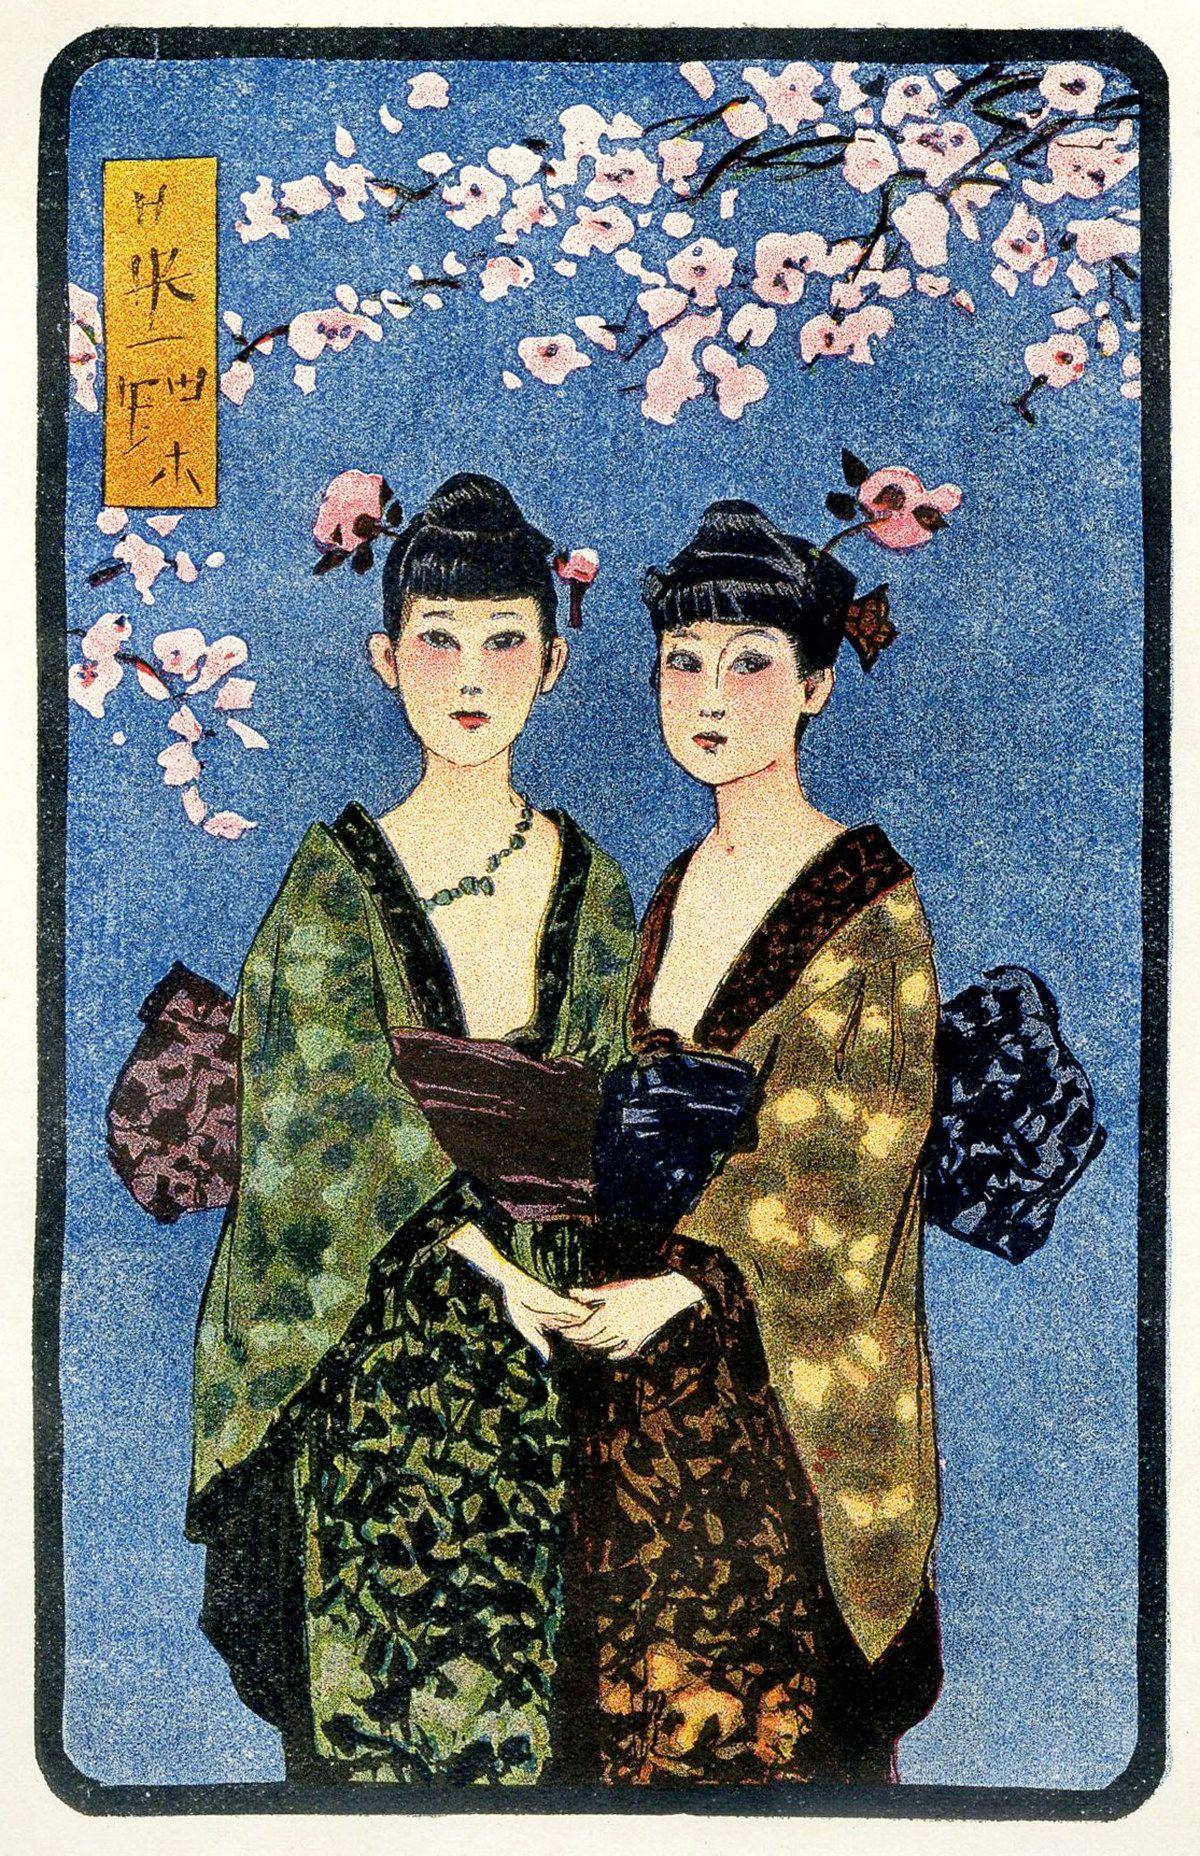 Vintage Lesbians/Bisexual 1800s-1950s